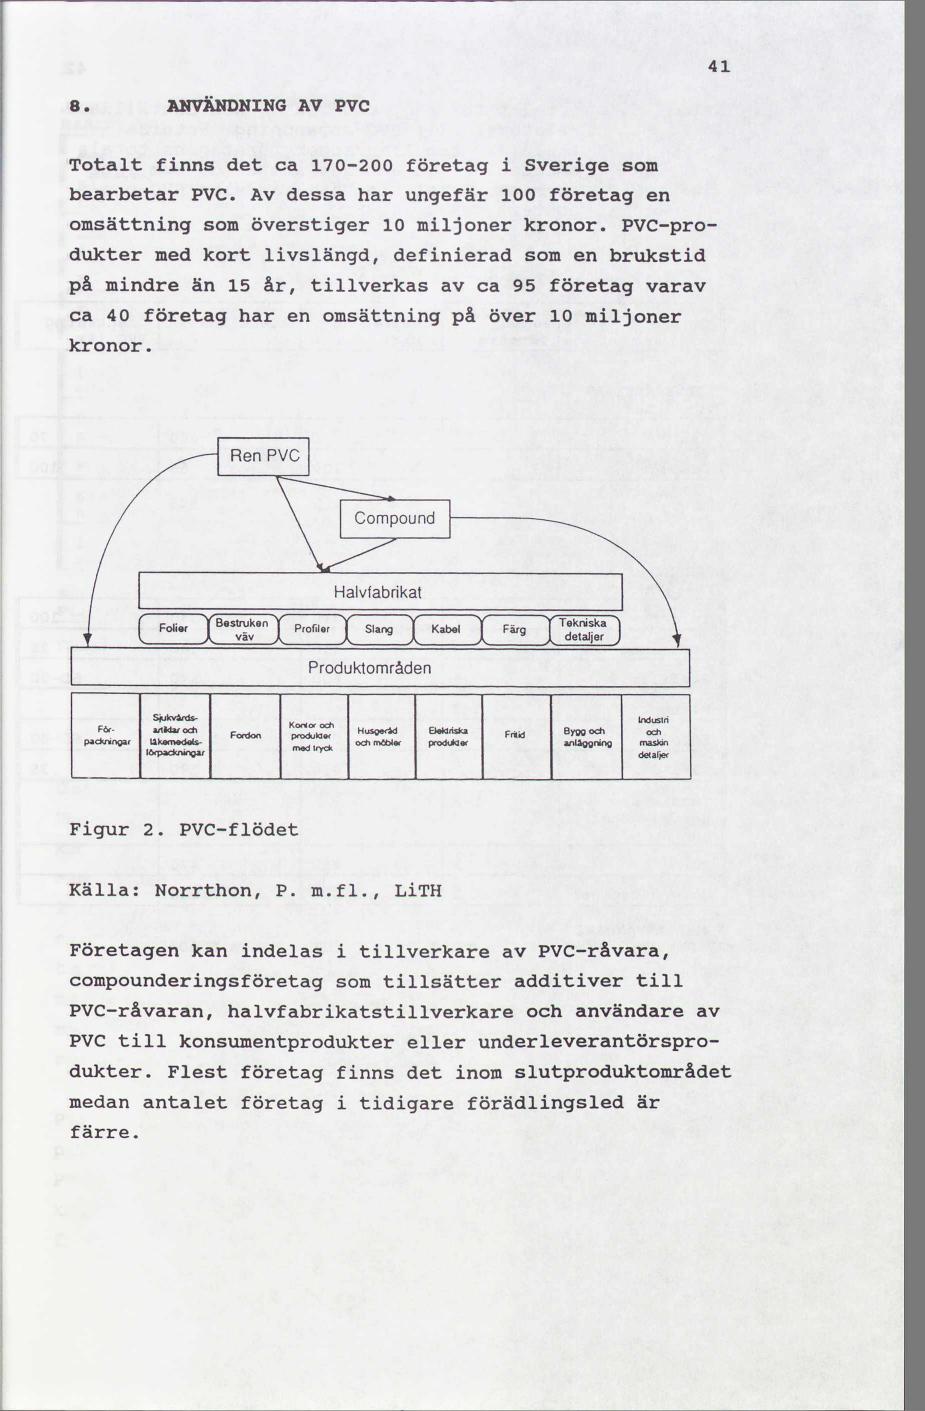 Rune fabrik 4 dating Kiel